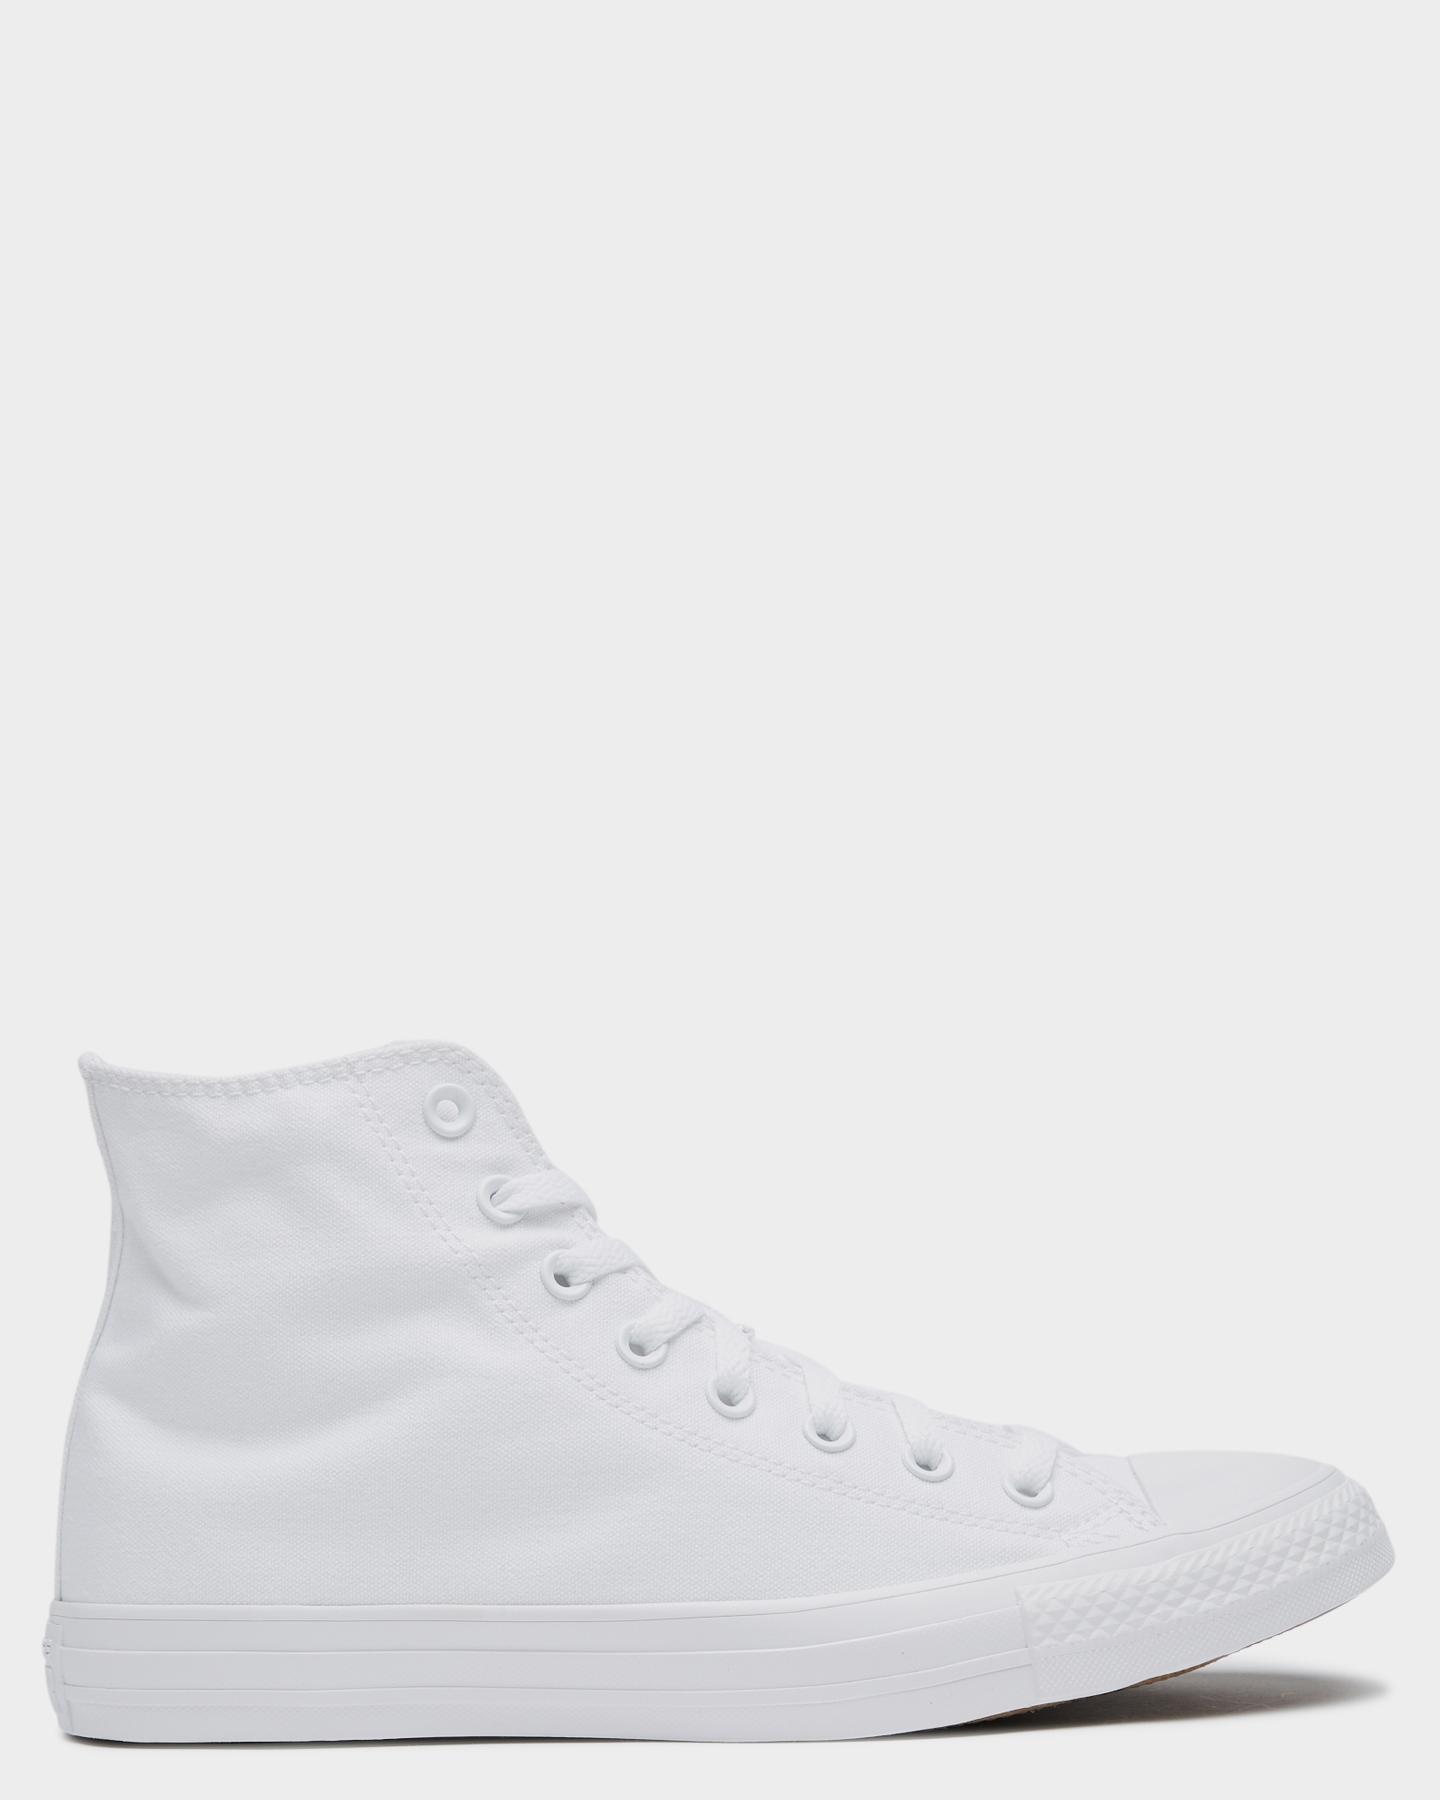 Converse Mens Chuck Taylor All Star Hi Shoe White Monochrome